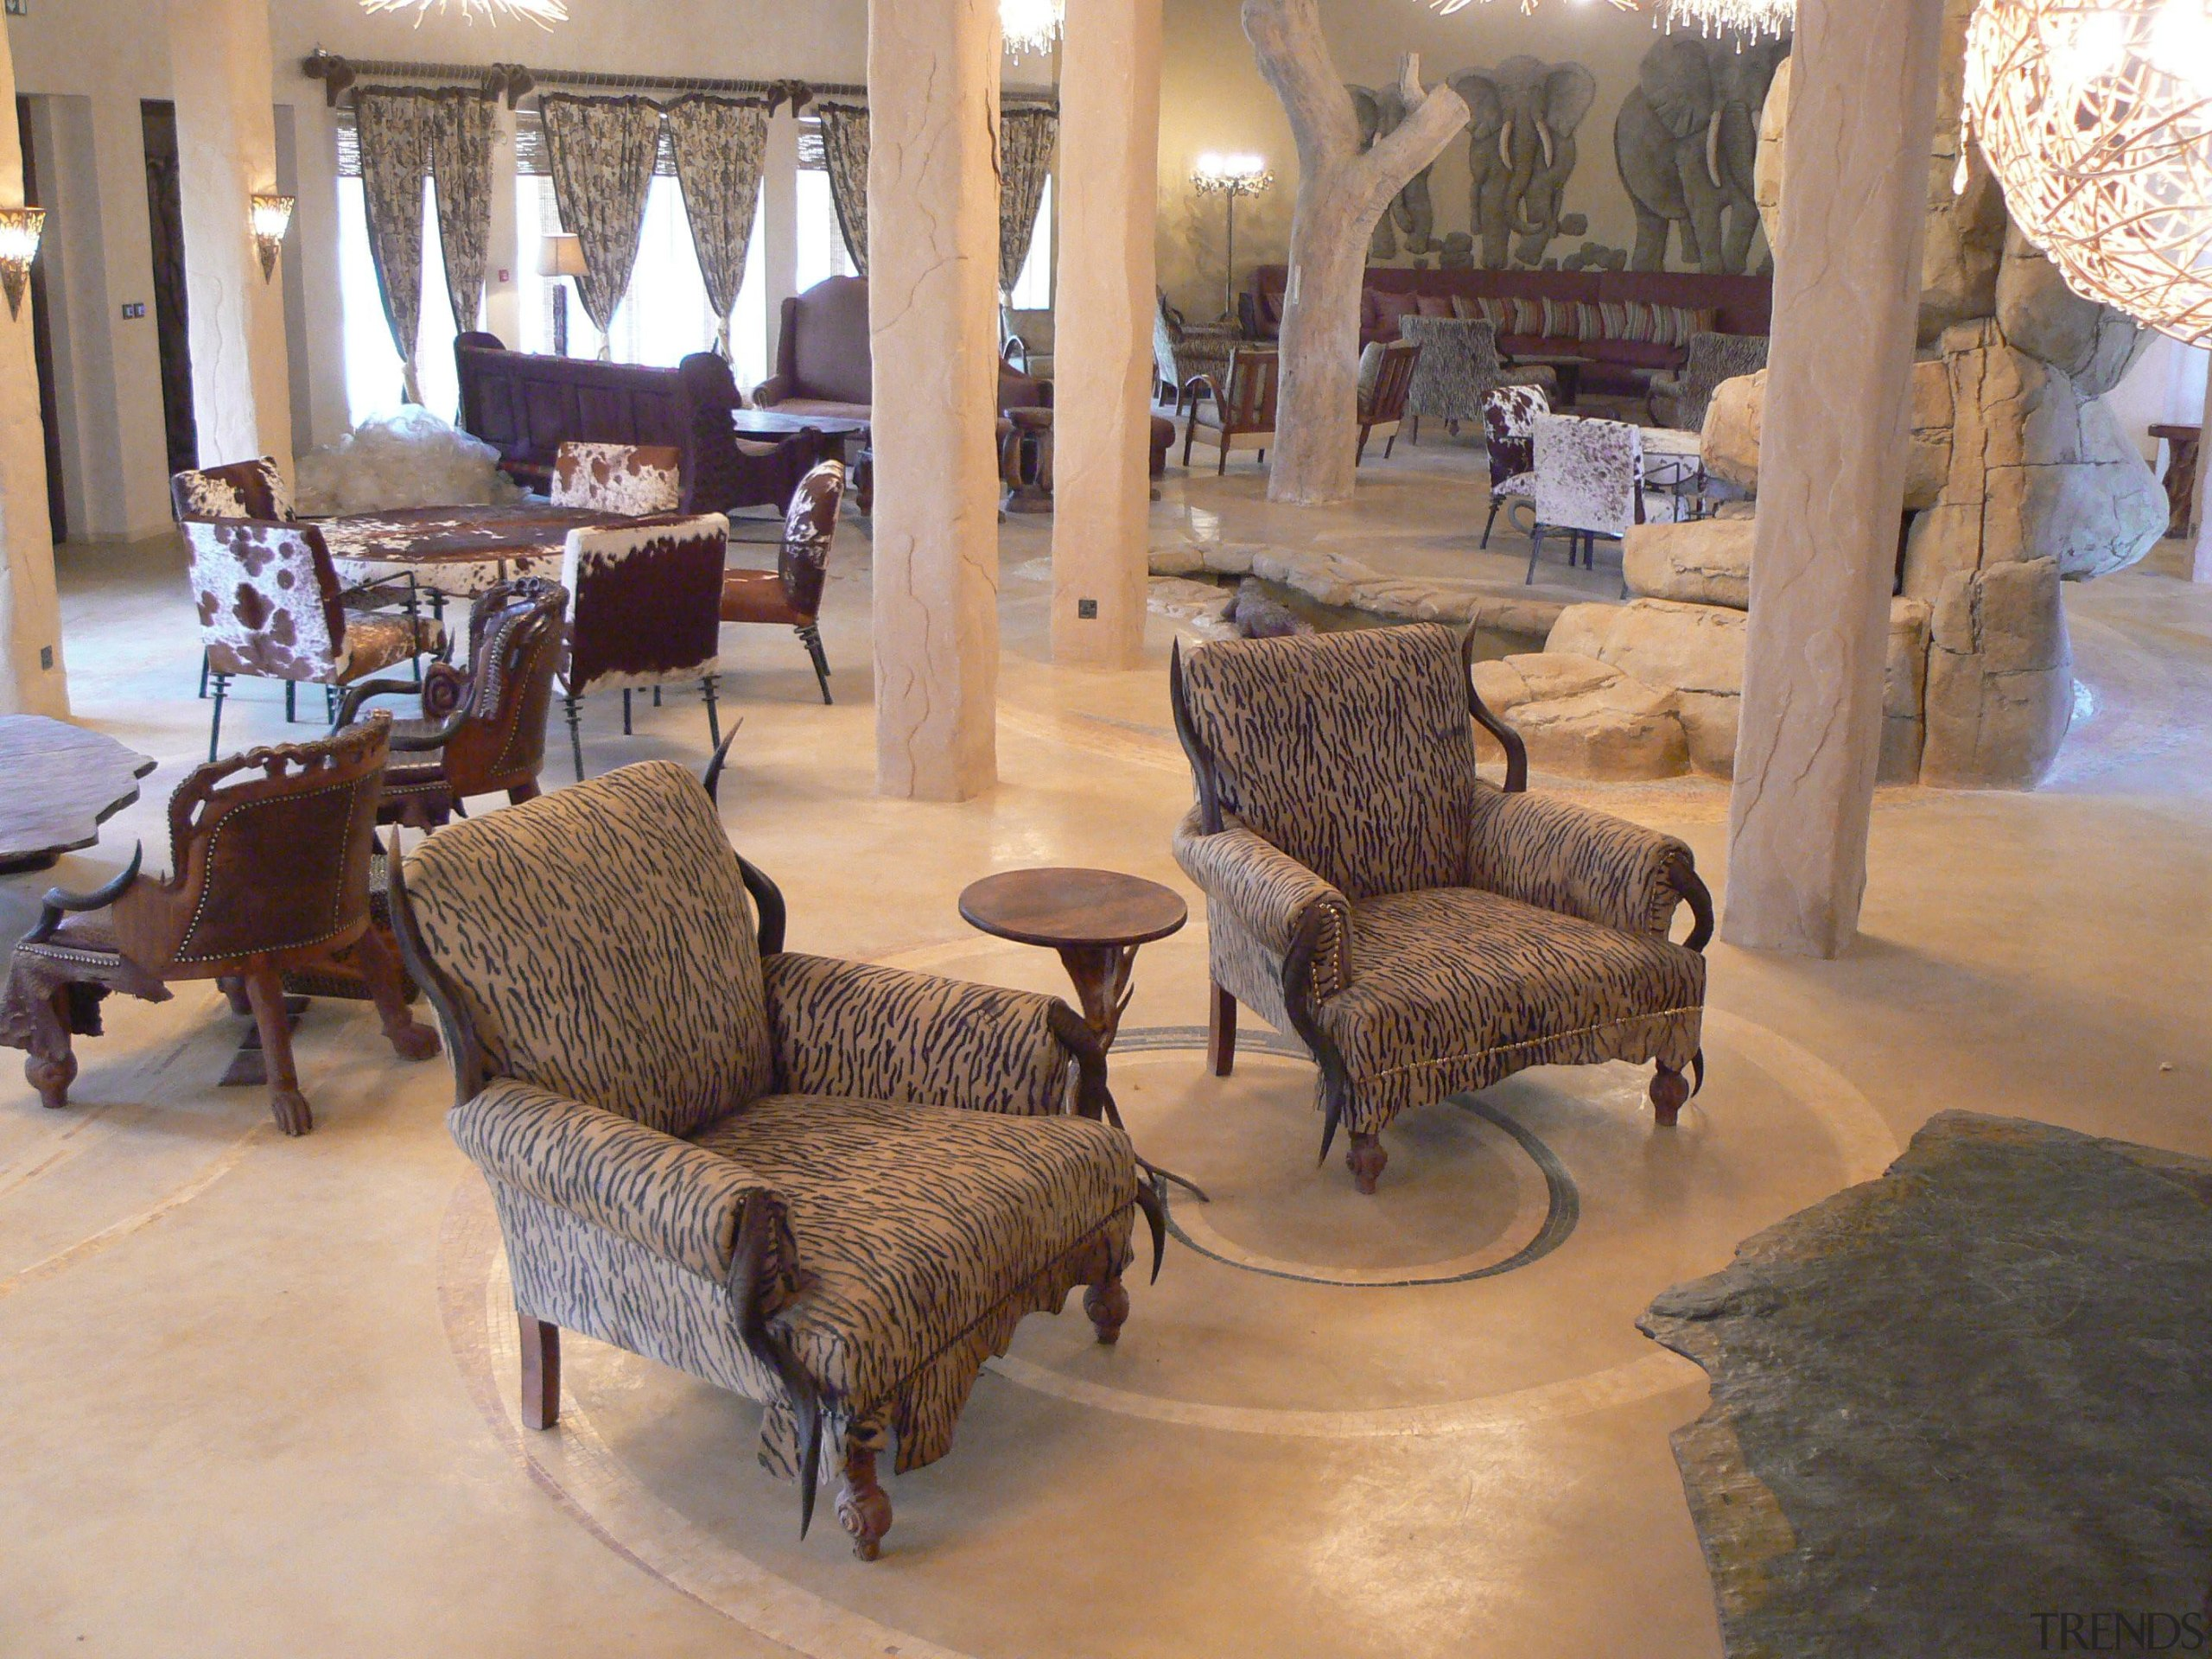 Colour hardener  5 - Colour_hardener__5 - chair chair, floor, flooring, furniture, interior design, living room, table, gray